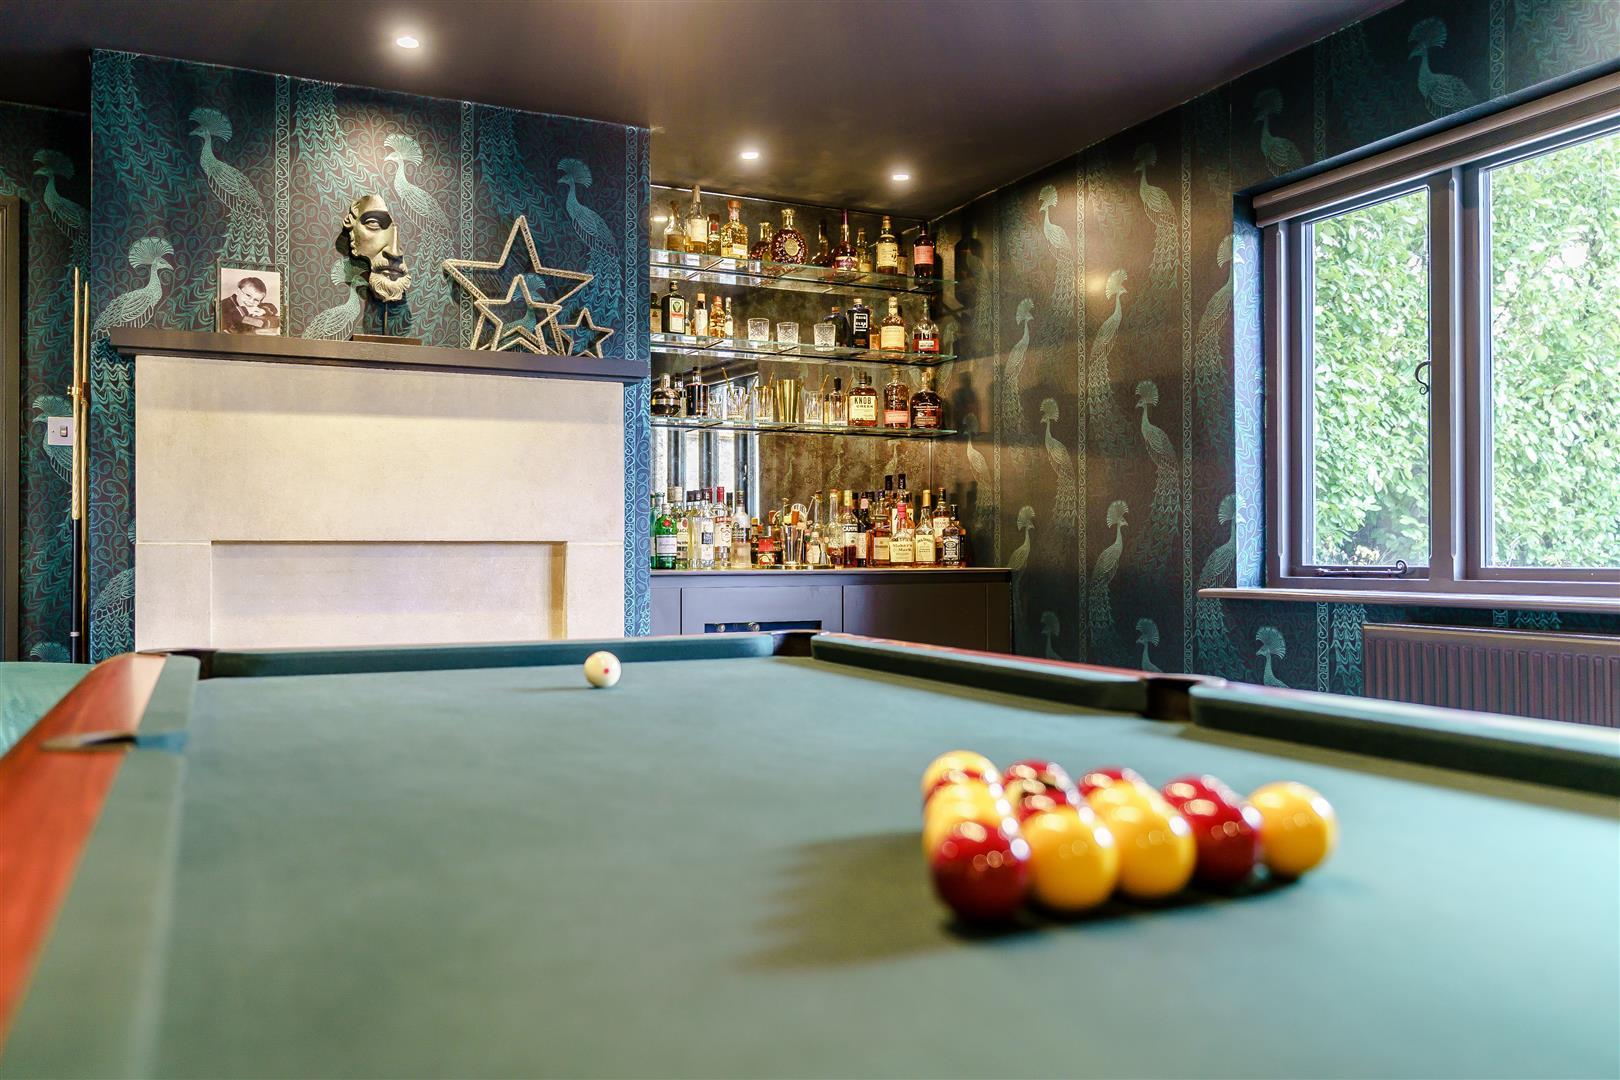 Rowstock Manor - Gallery Image 14 - Games / Bar Room